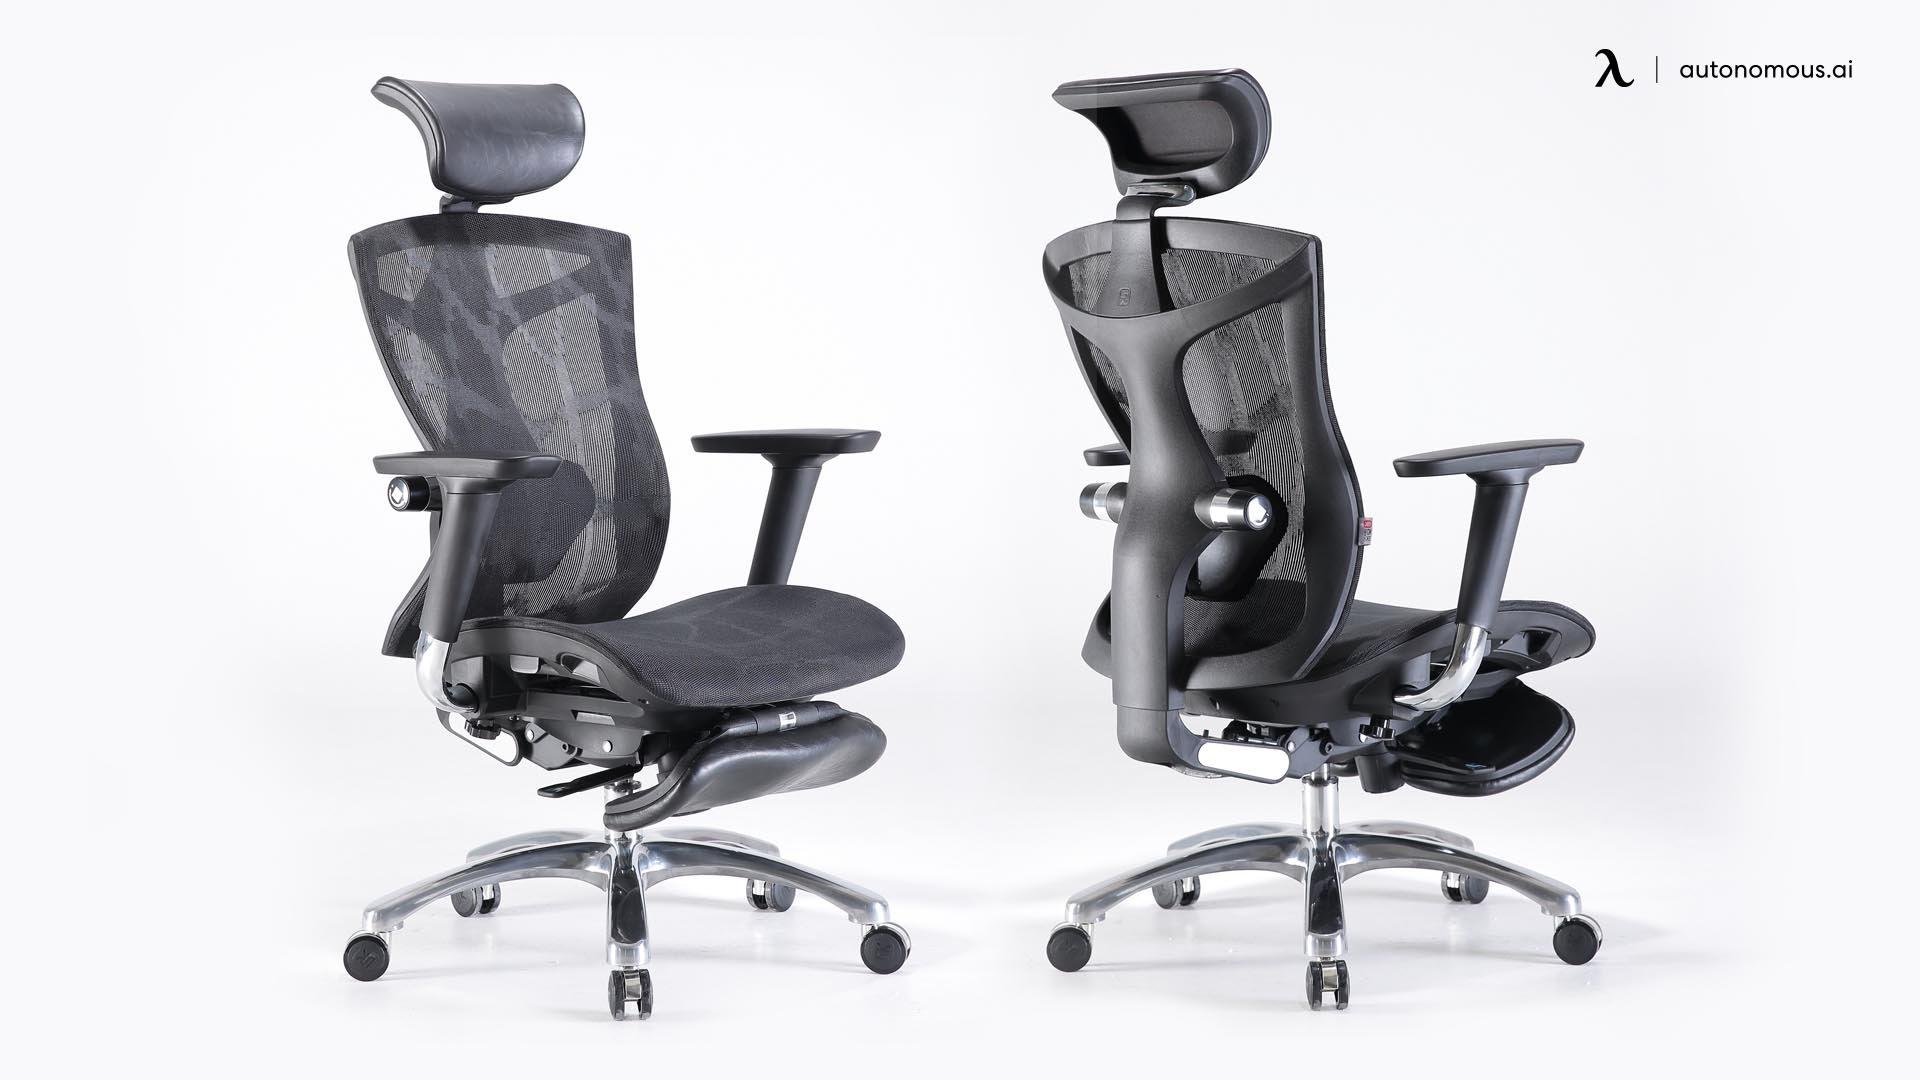 Sihoo Comfortable Desk Chair